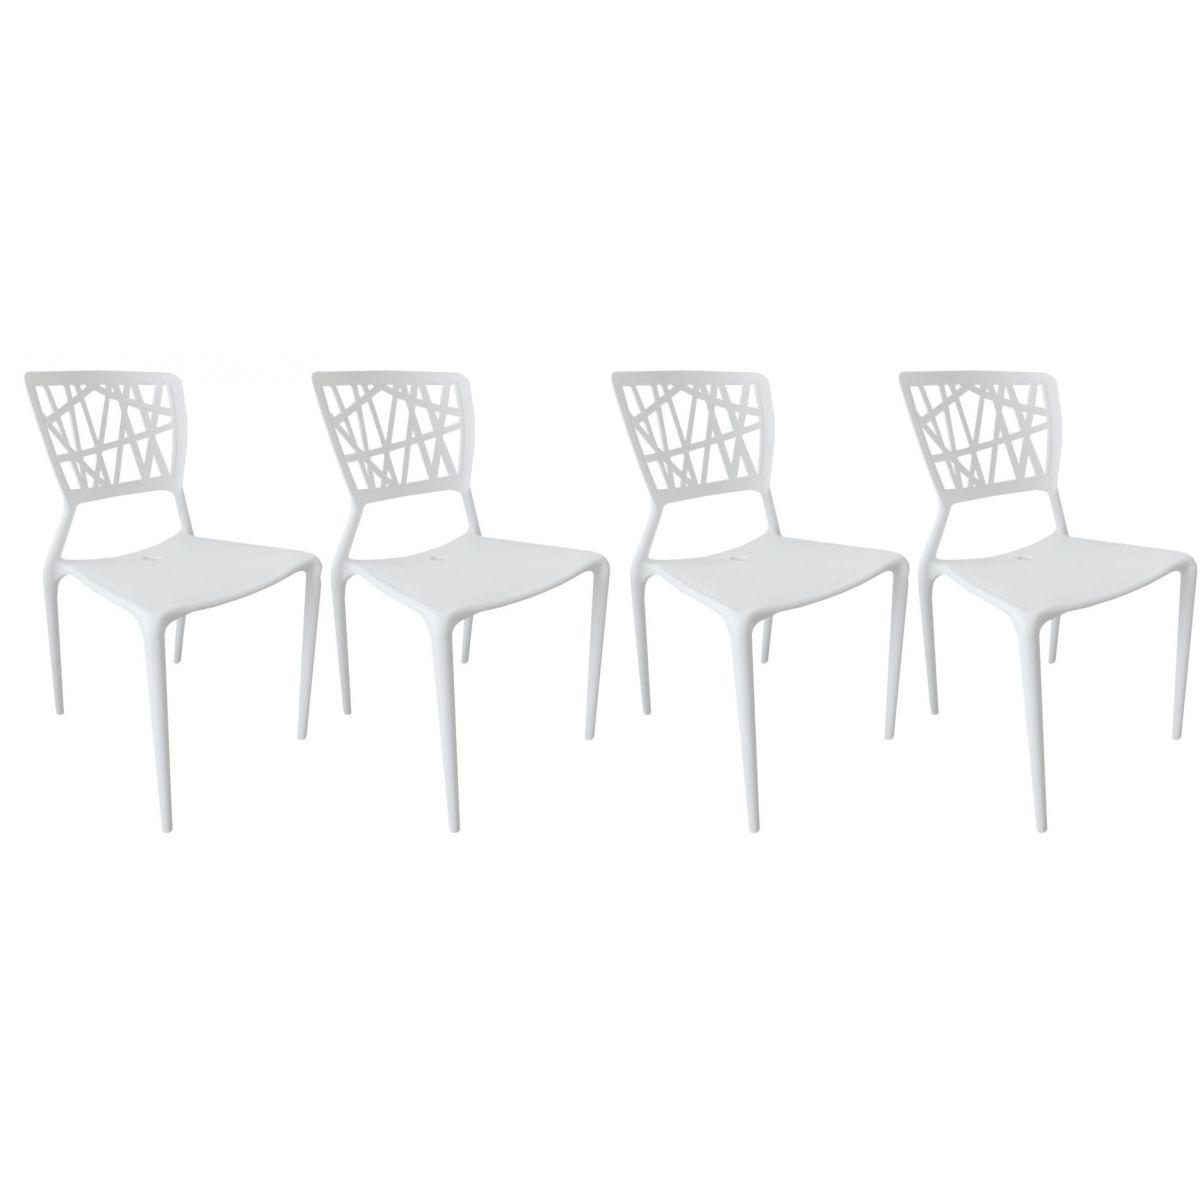 Kit 4 Cadeiras Design Melissa Pelegrin PEL 1193 Cor Branca